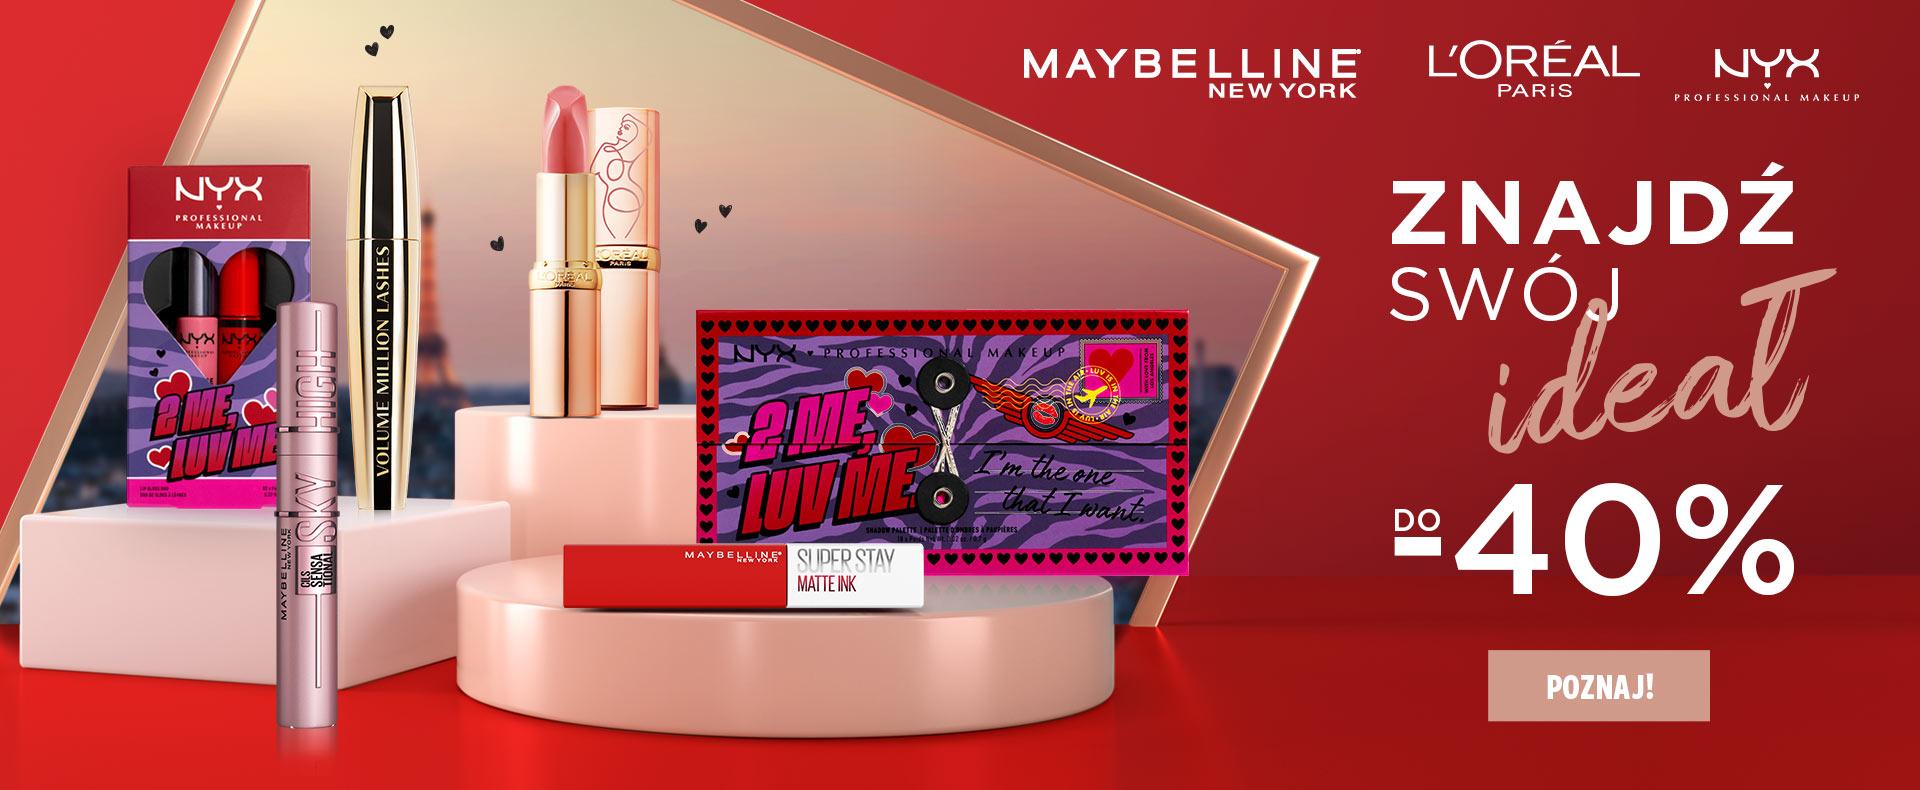 Ezebra: do 40% rabatu na kosmetyki marek Maybelline, L'Oreal, NYX